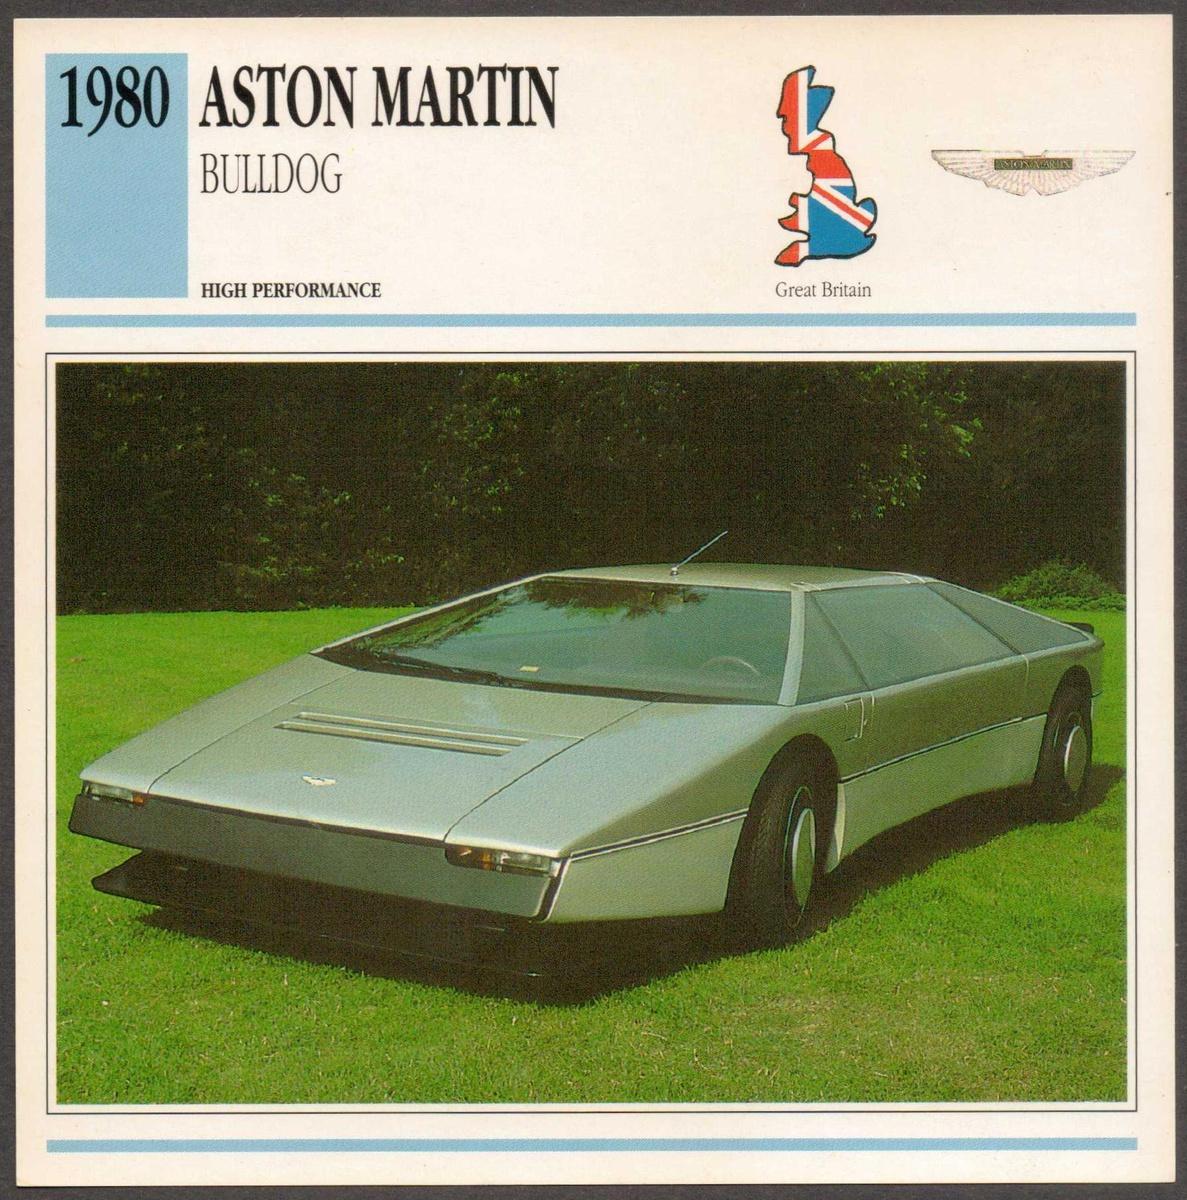 Vintage Car Card Aston Martin Bulldog Collectors Weekly - Aston martin bulldog